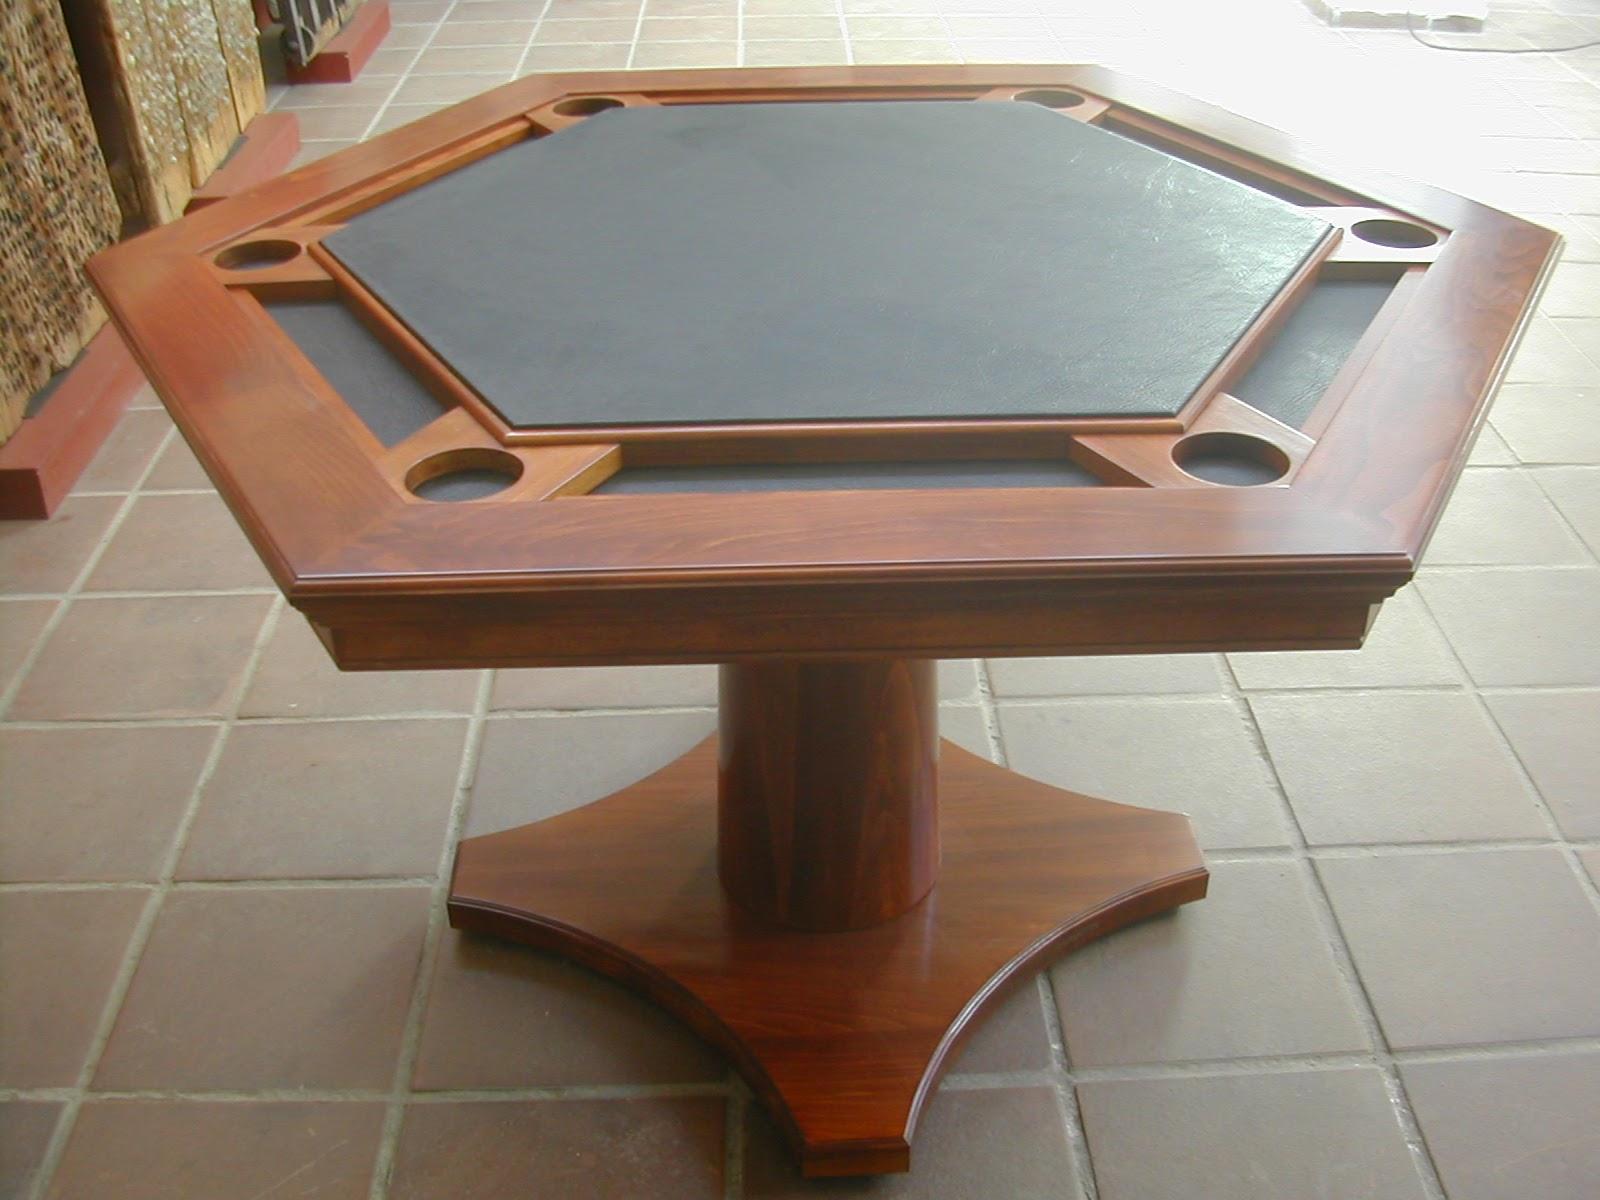 Billares soto mesas de poker mesas de billar mesas for Mesas de billar modernas